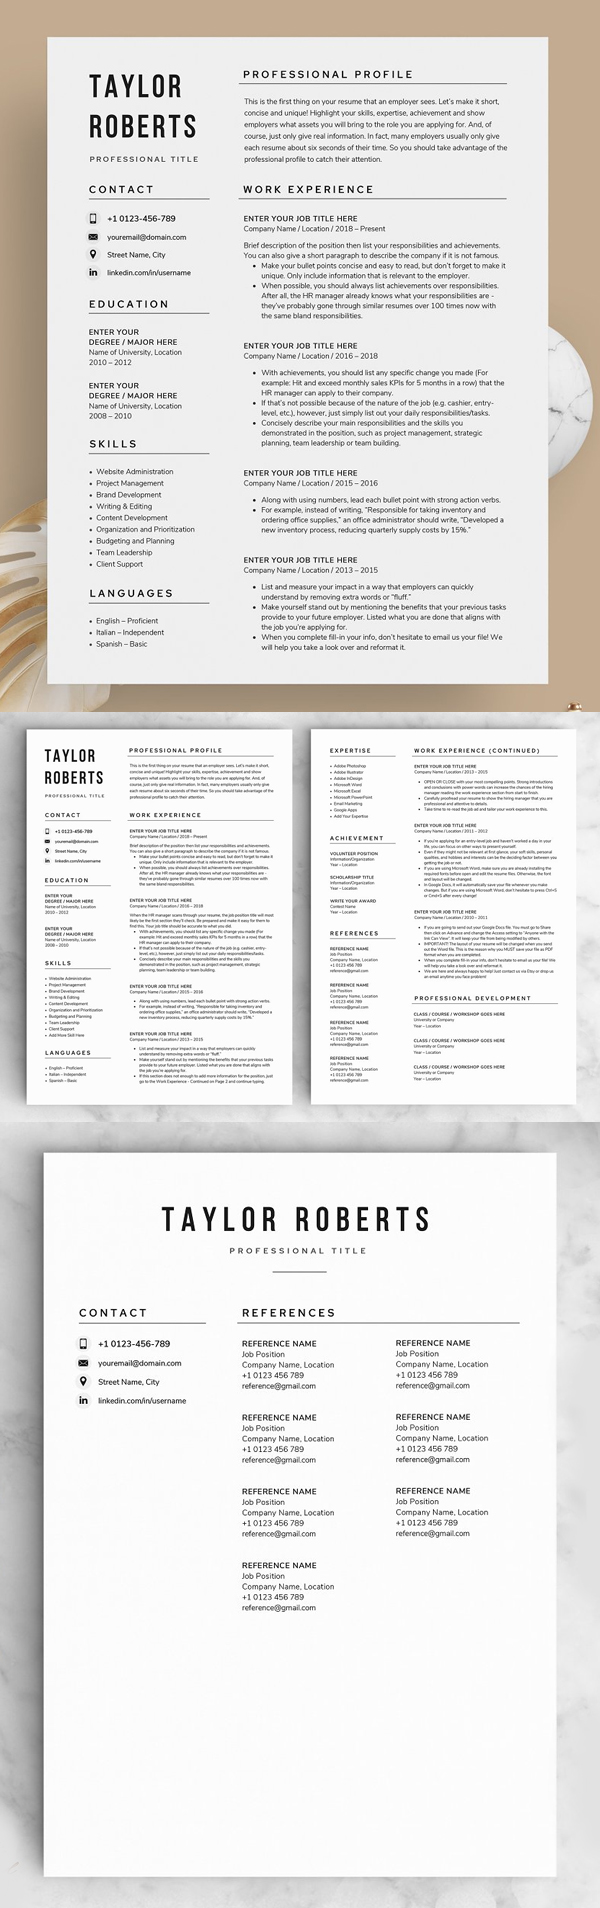 Resume/CV - The Taylor